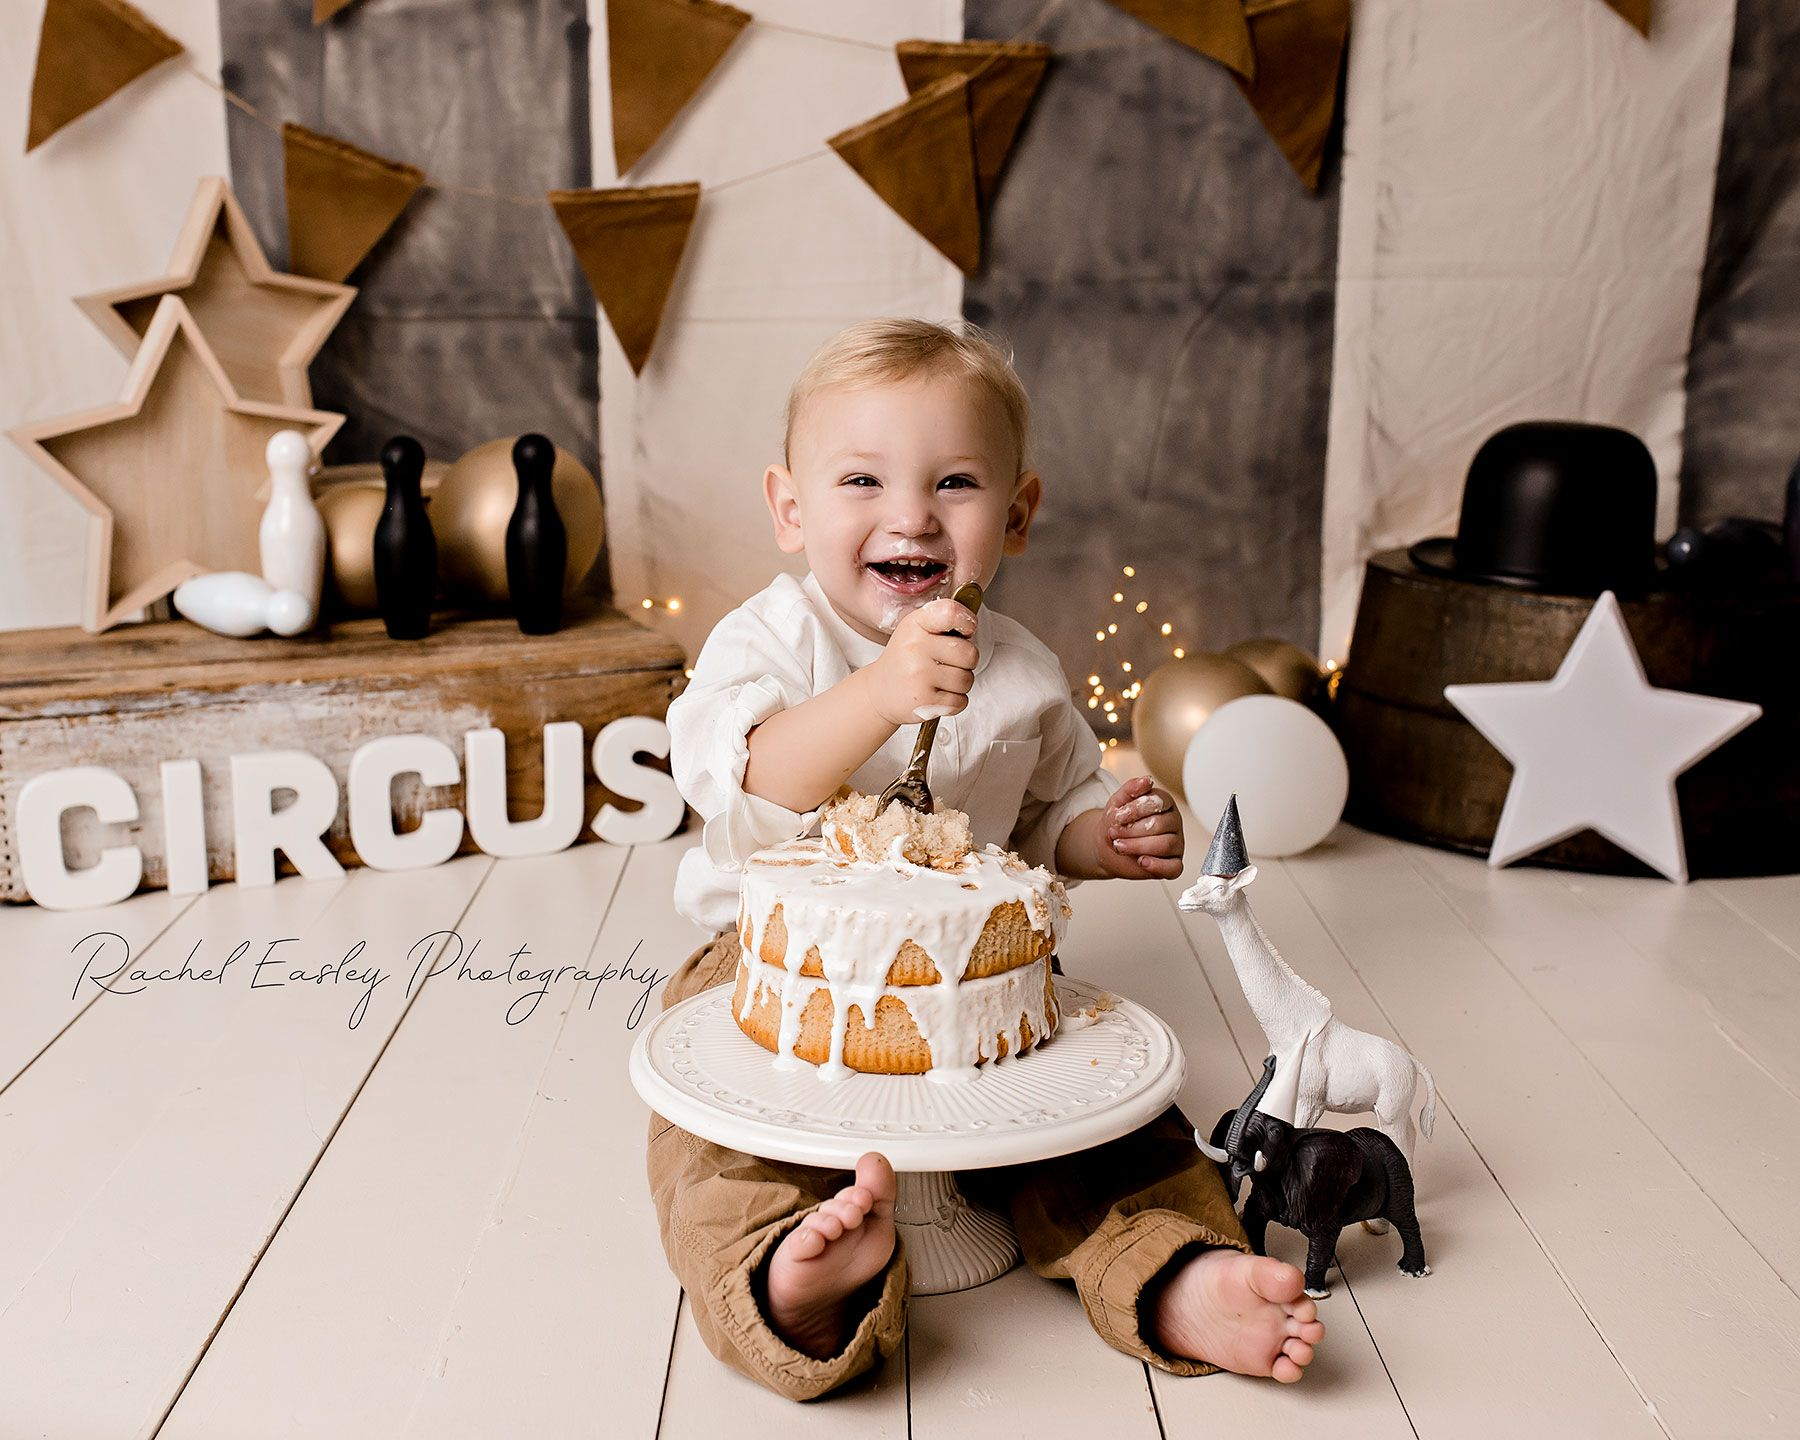 Vintage Circus Cake Smash Brisbane Cake Smash Photographer Www Racheleasleyphotography Com Au Circus Cake Baby Cake Smash Cake Smash